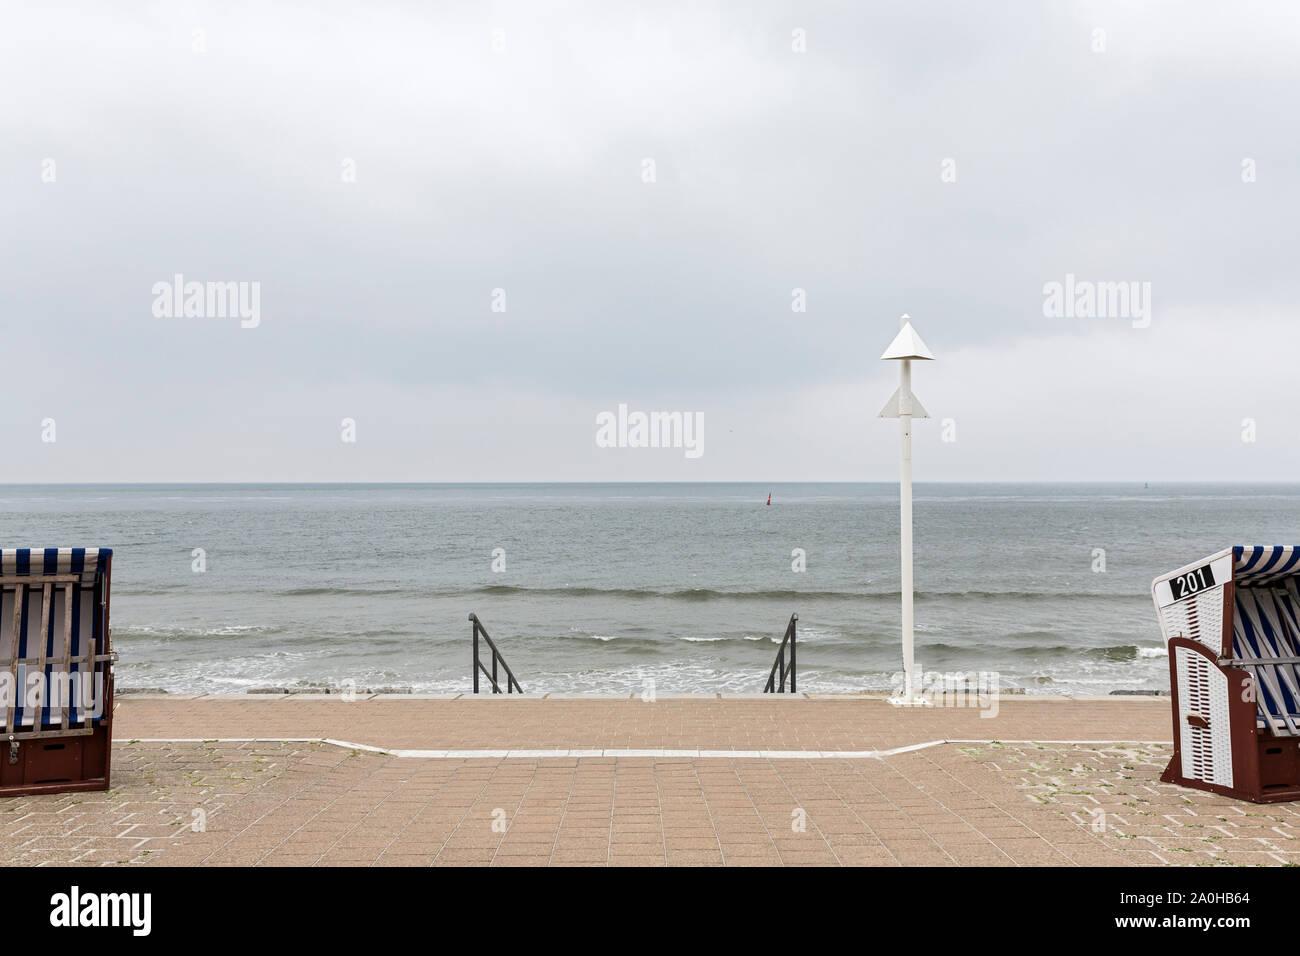 Norderney; Strandpromenade, Strandkoerbe, Meerblick Stock Photo